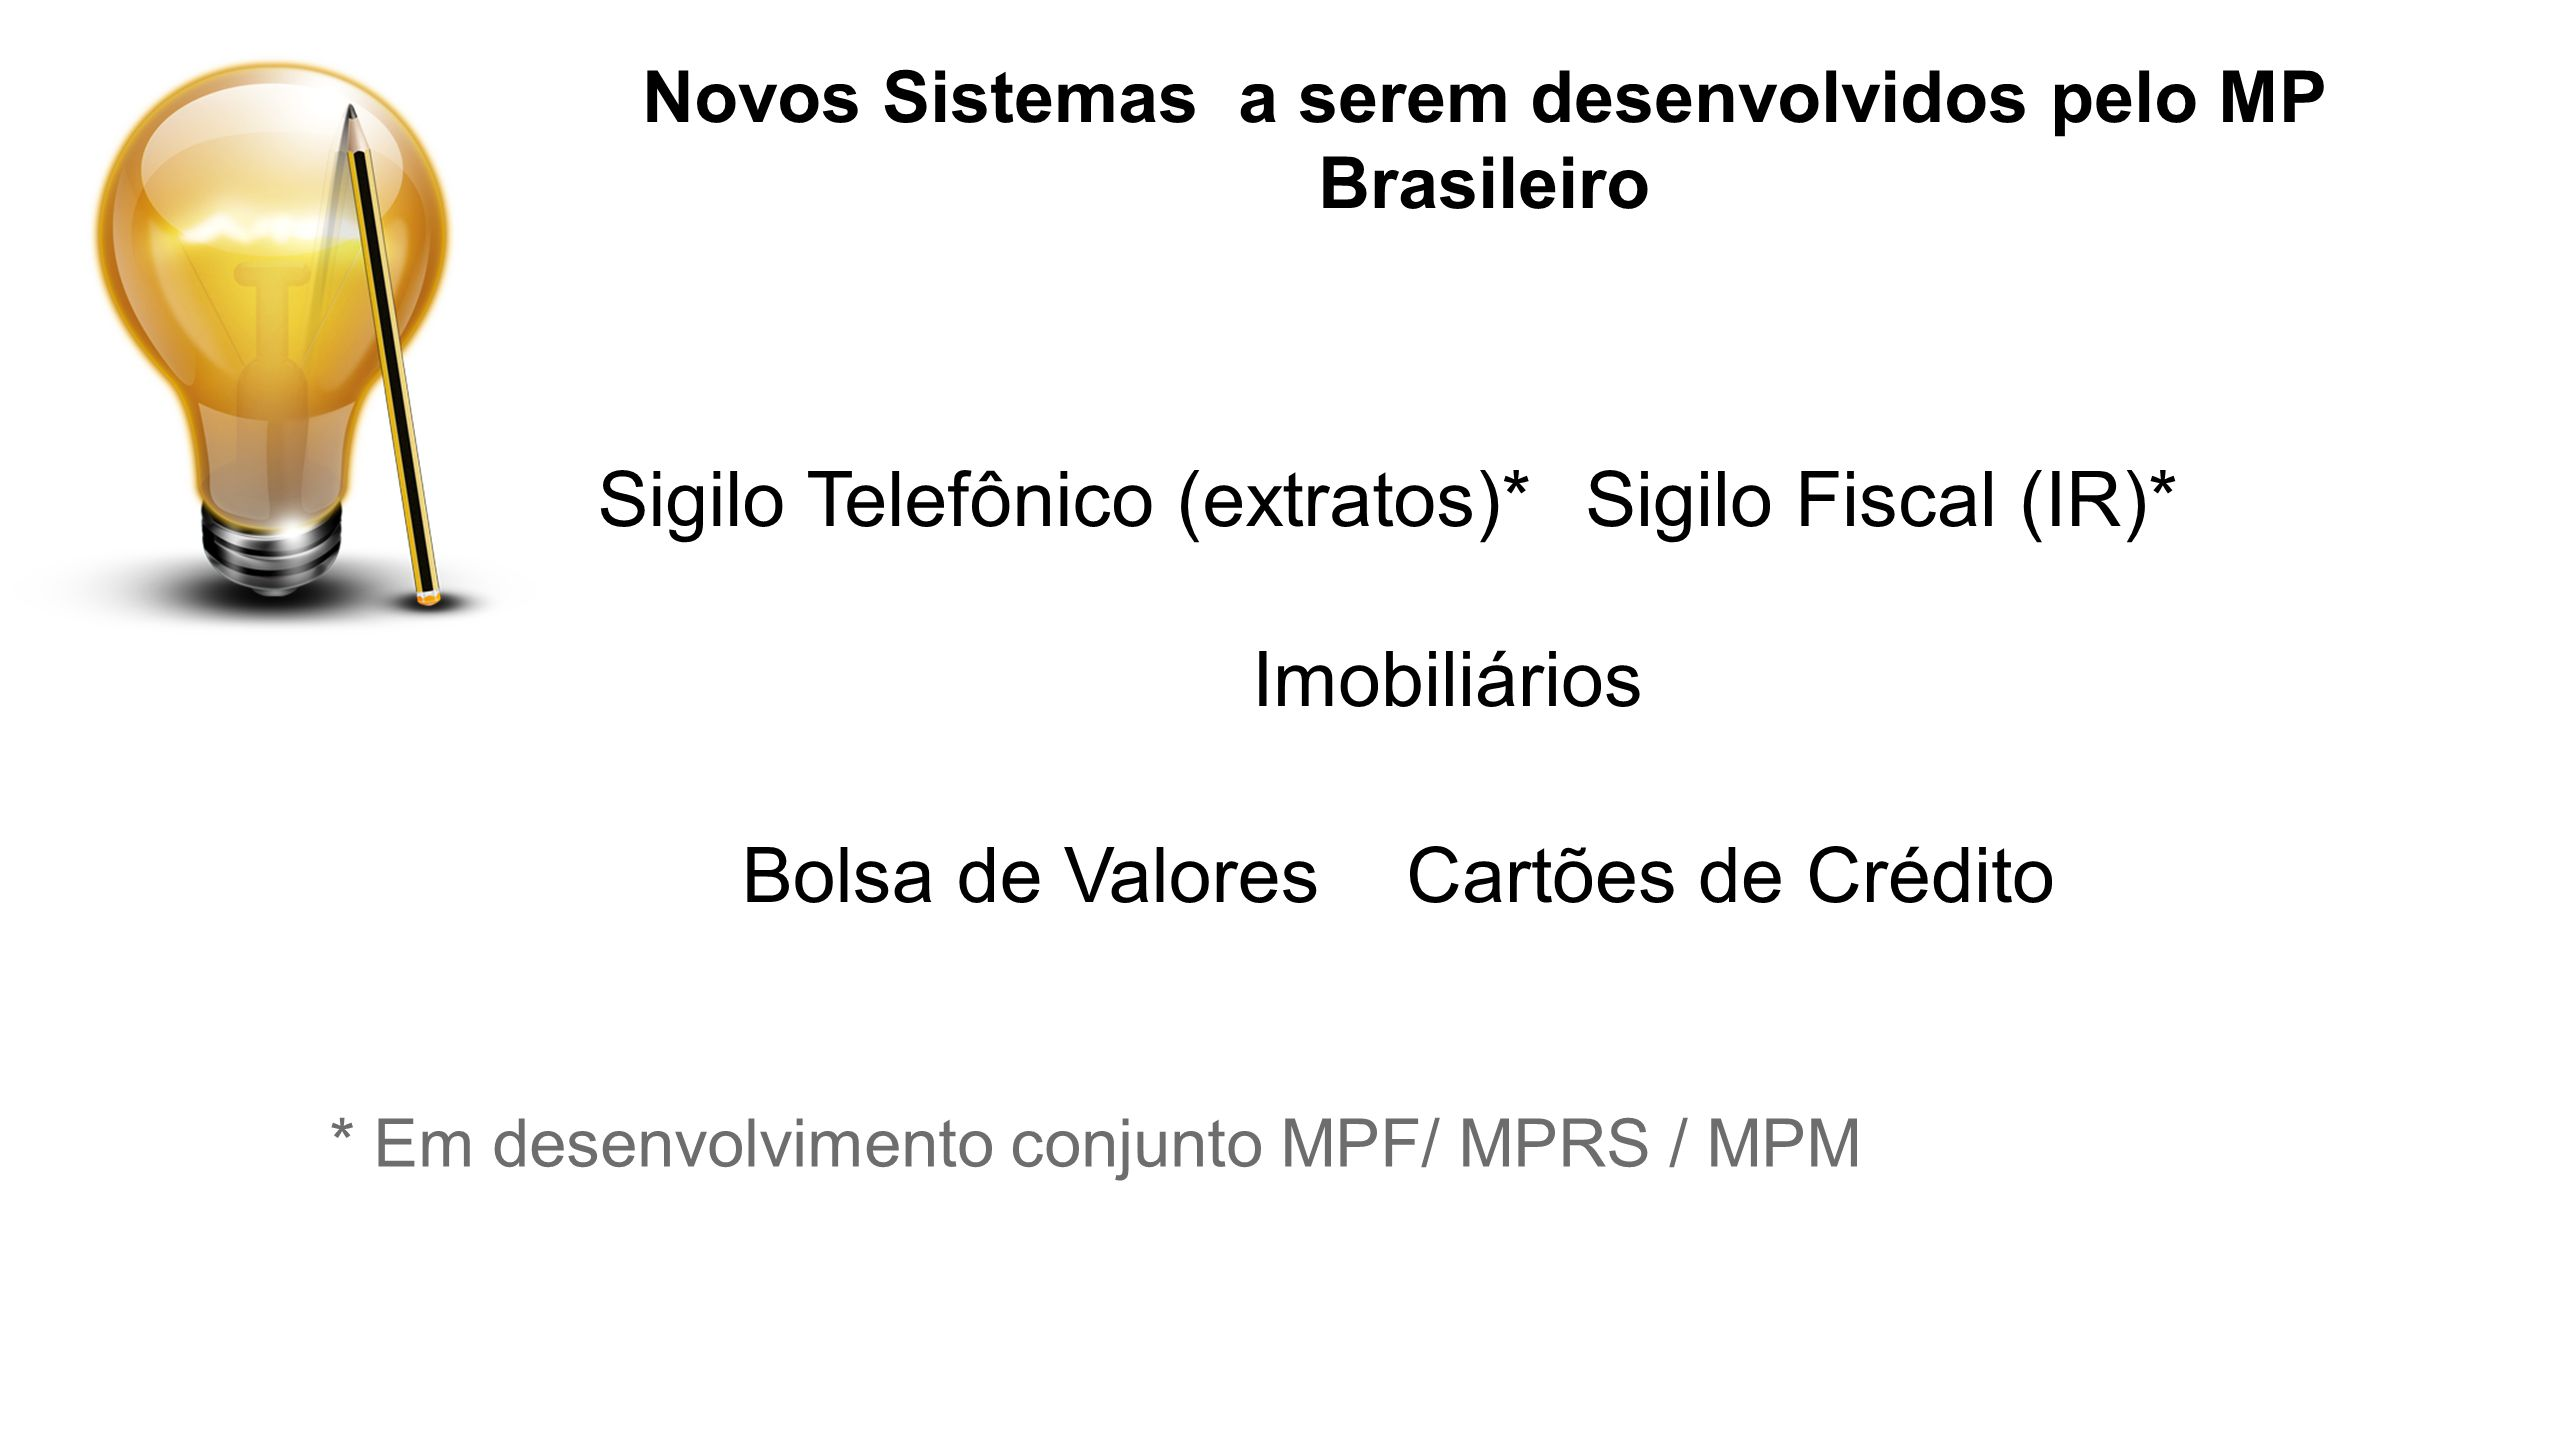 Novos Sistemas a serem desenvolvidos pelo MP Brasileiro